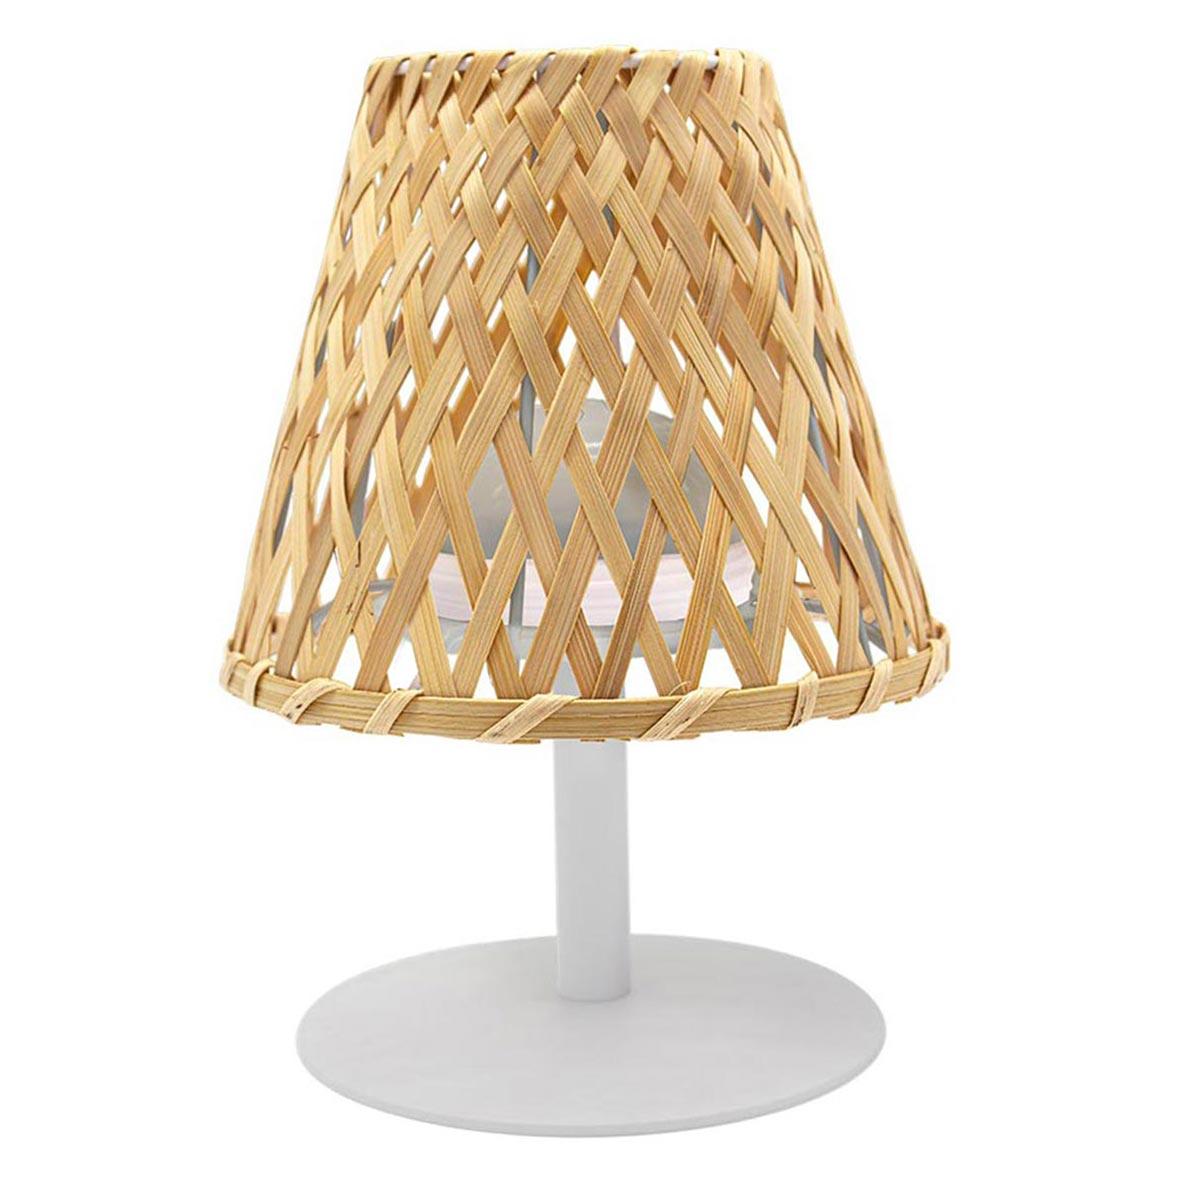 Lampe de table sans fil IBIZA bois en bambou 26cm